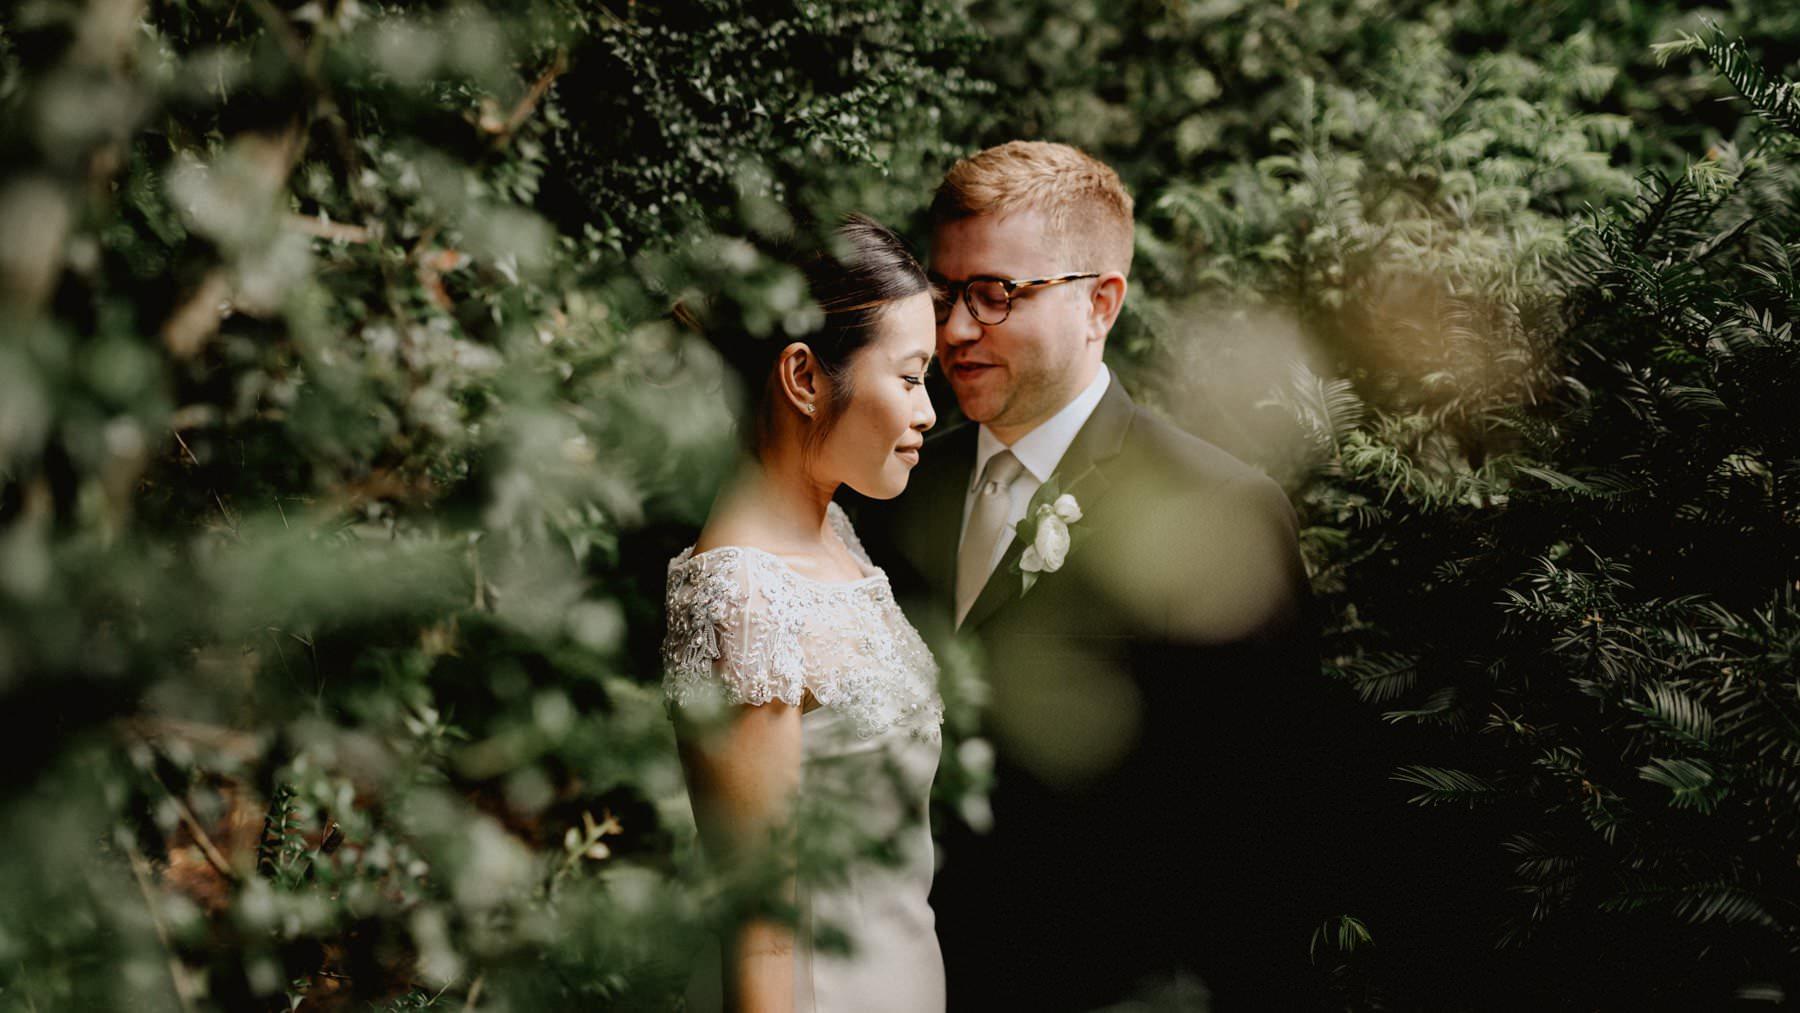 Appleford-estate-wedding-46.jpg